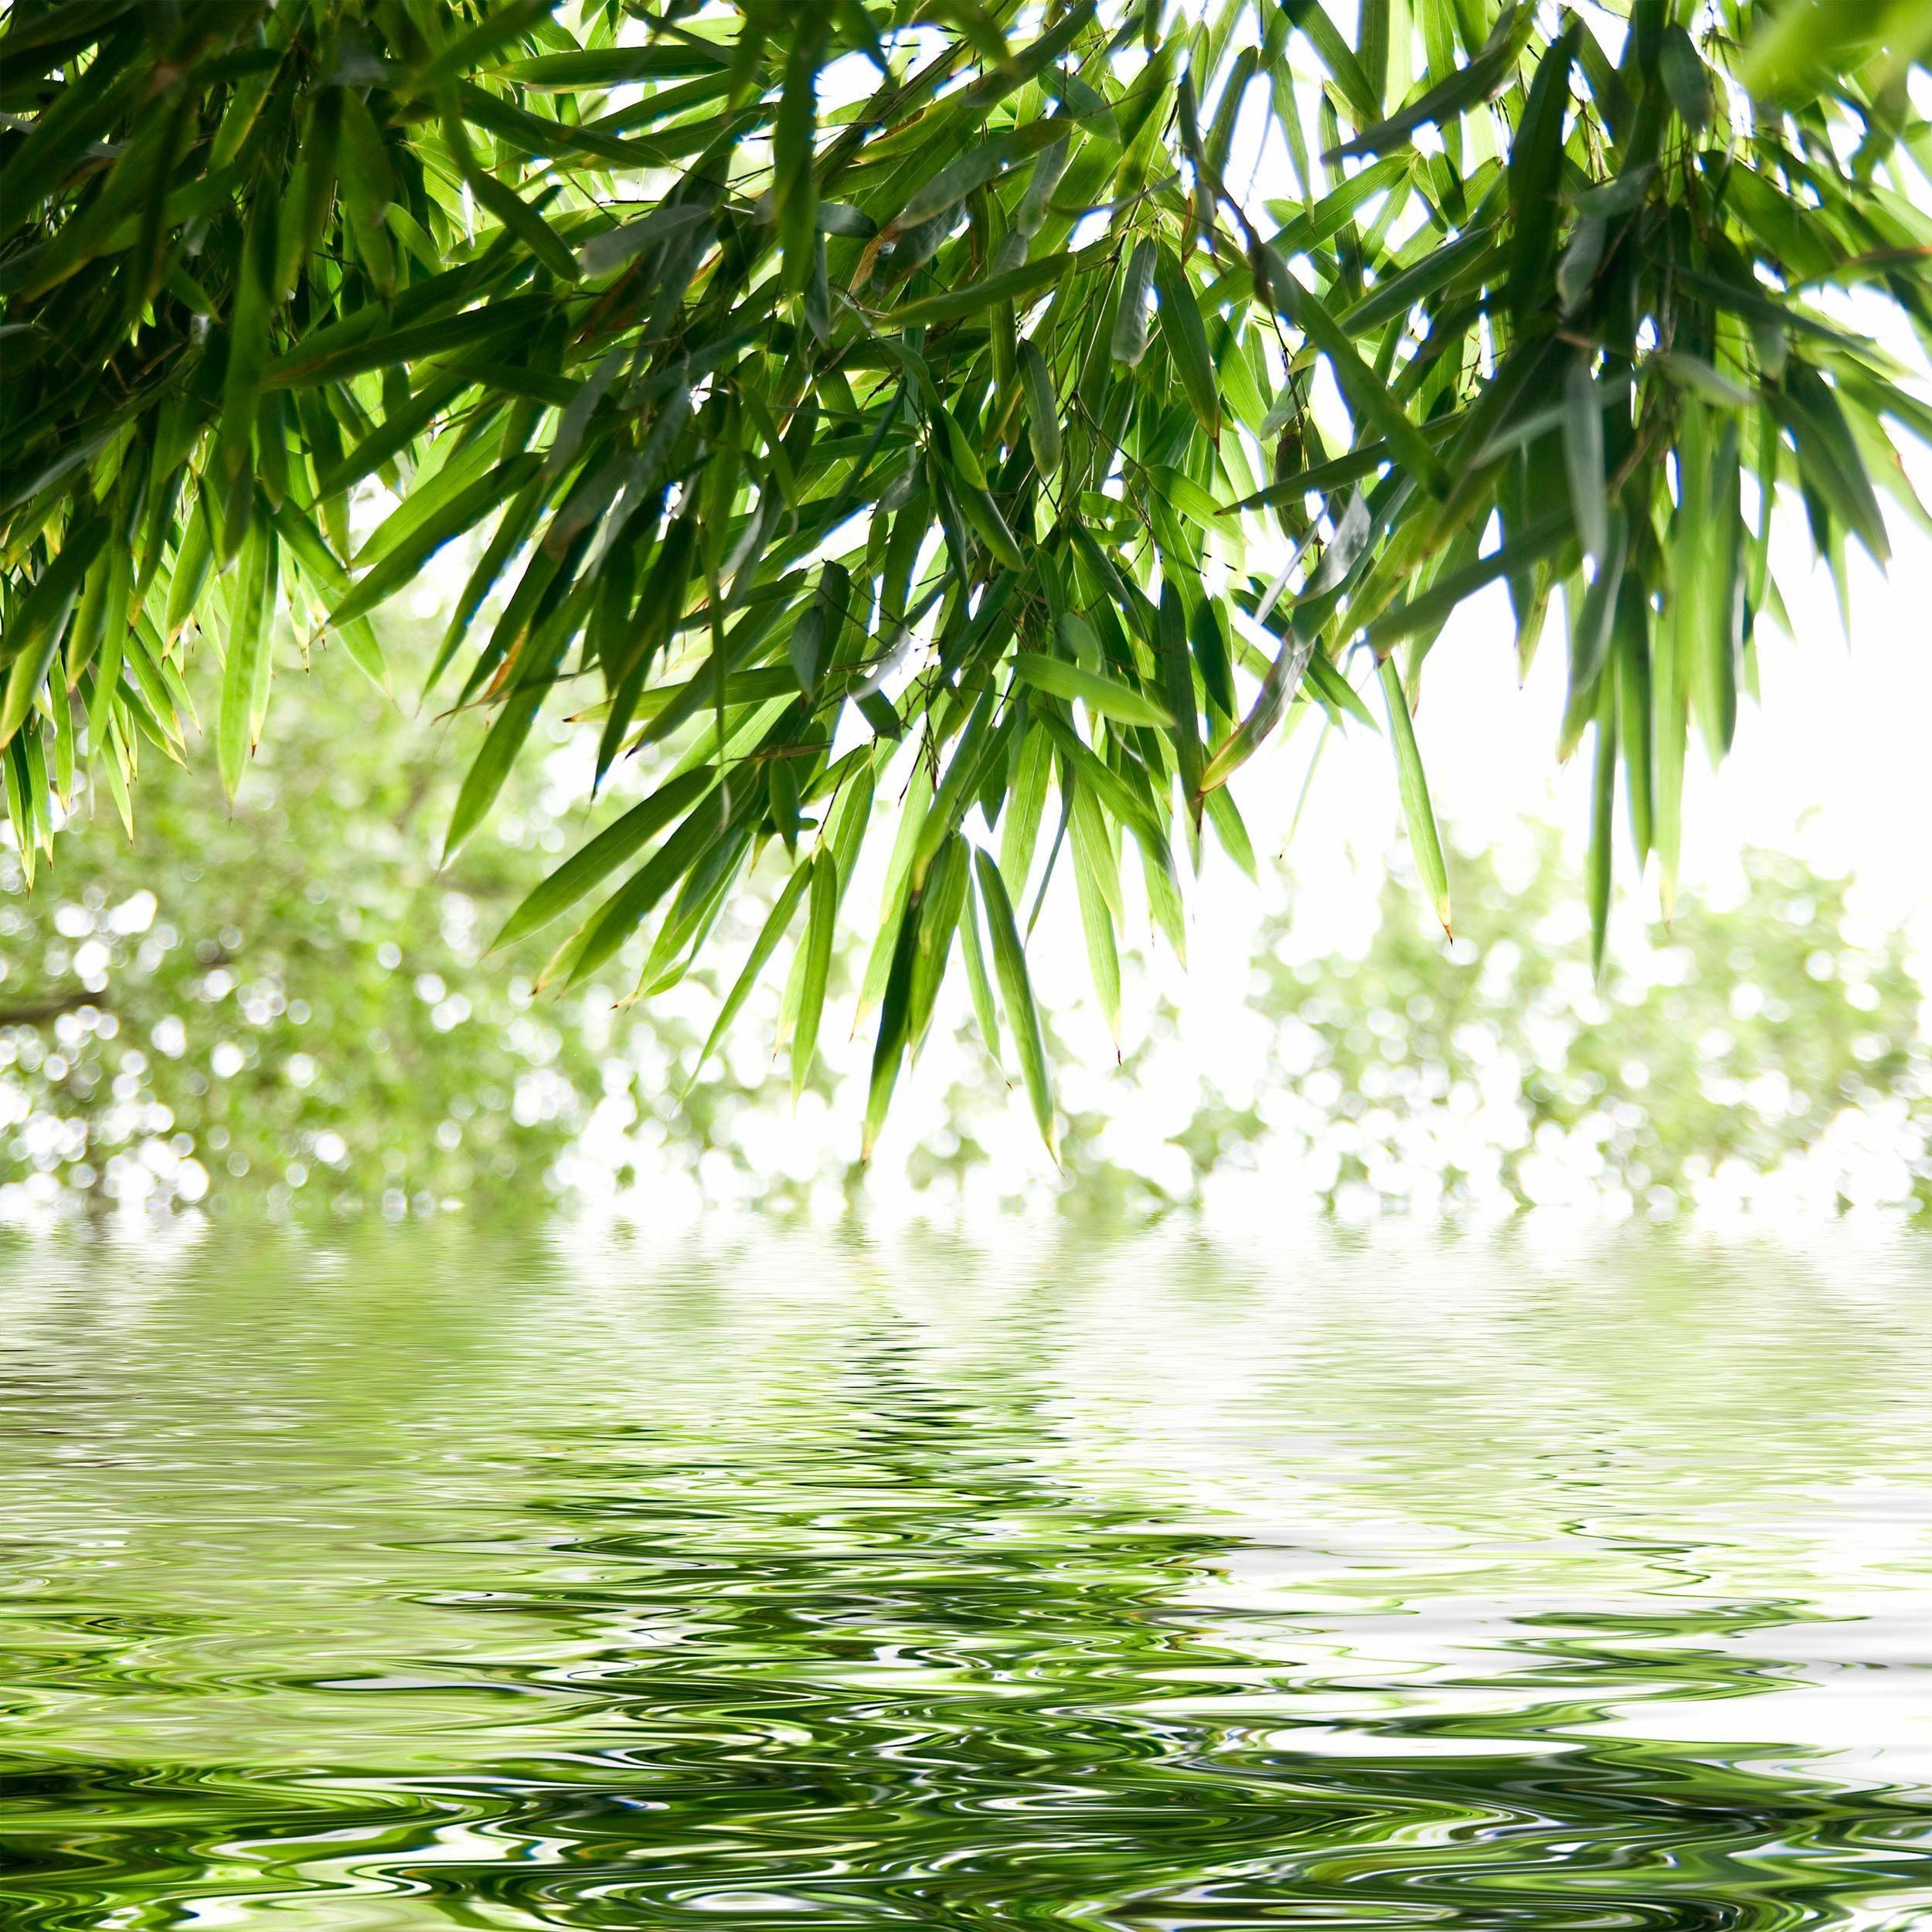 Glasbild, »Tropic«, 30/30cm